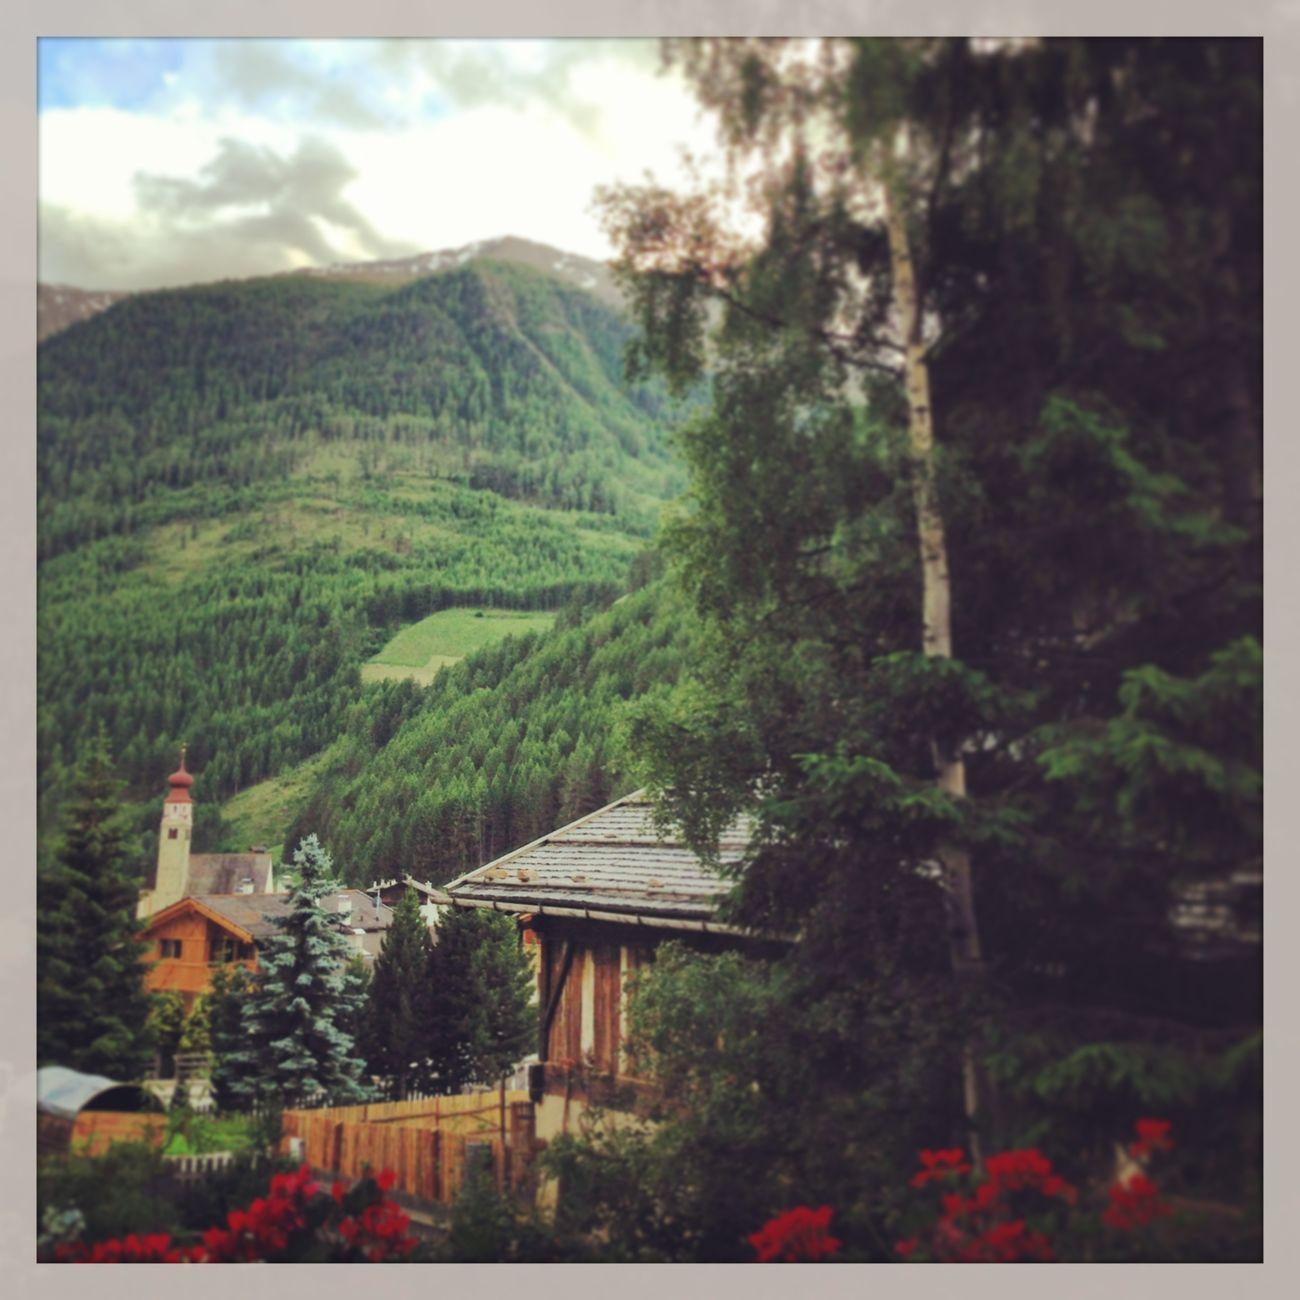 Lookslikeapainting Mountain Southtyrol  Summertime Timetoreflect Valsenales